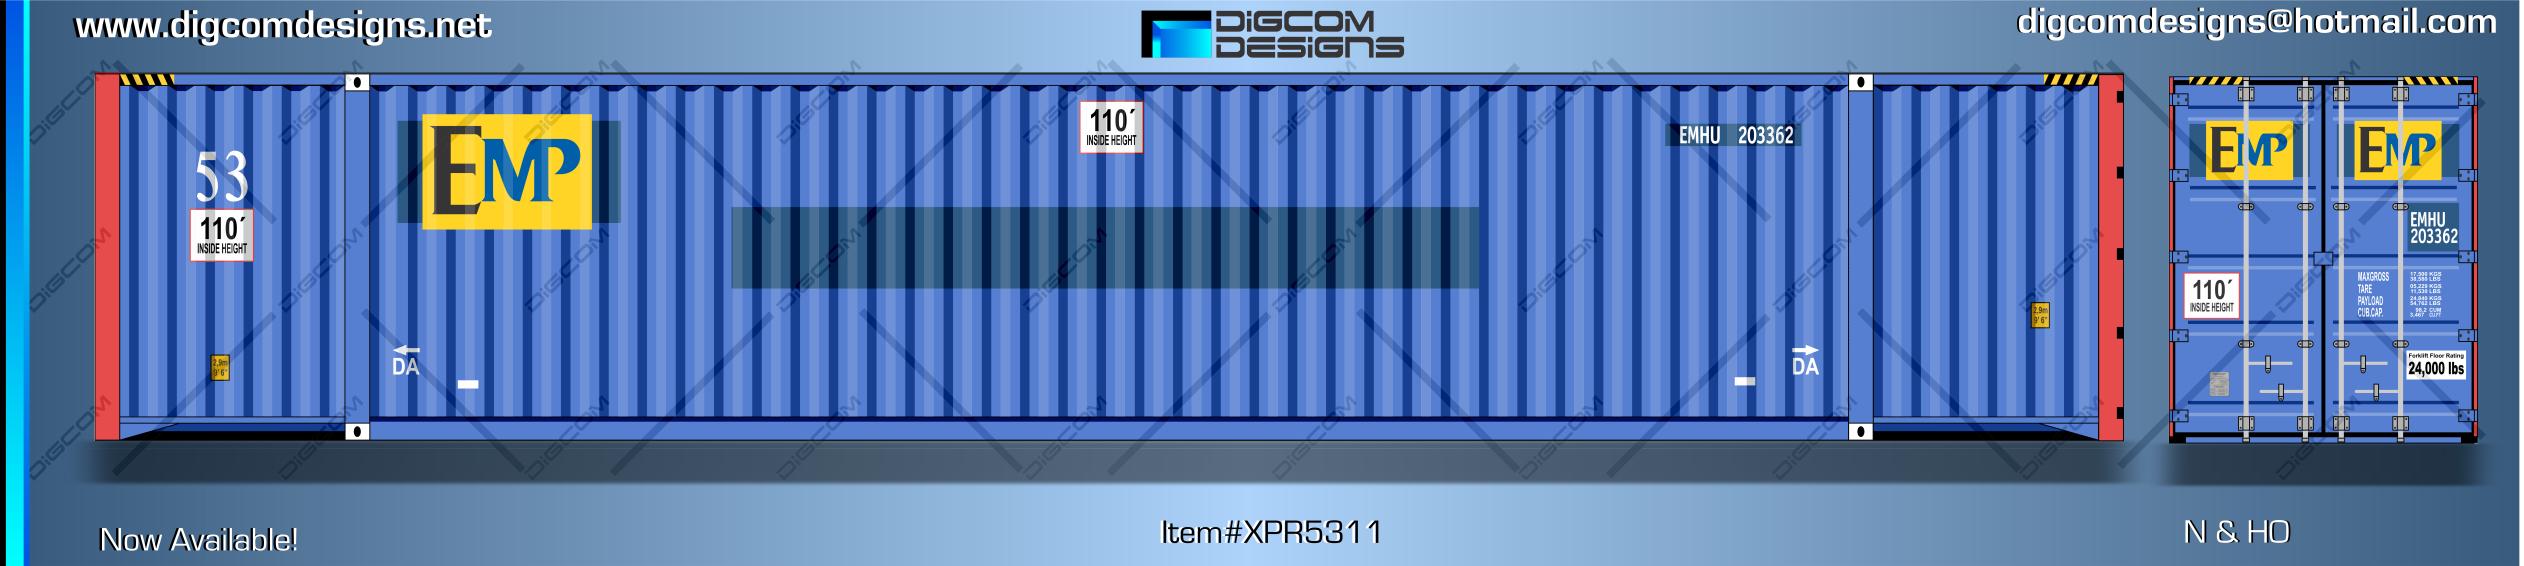 DIGCOMDESIGNSXPR5311